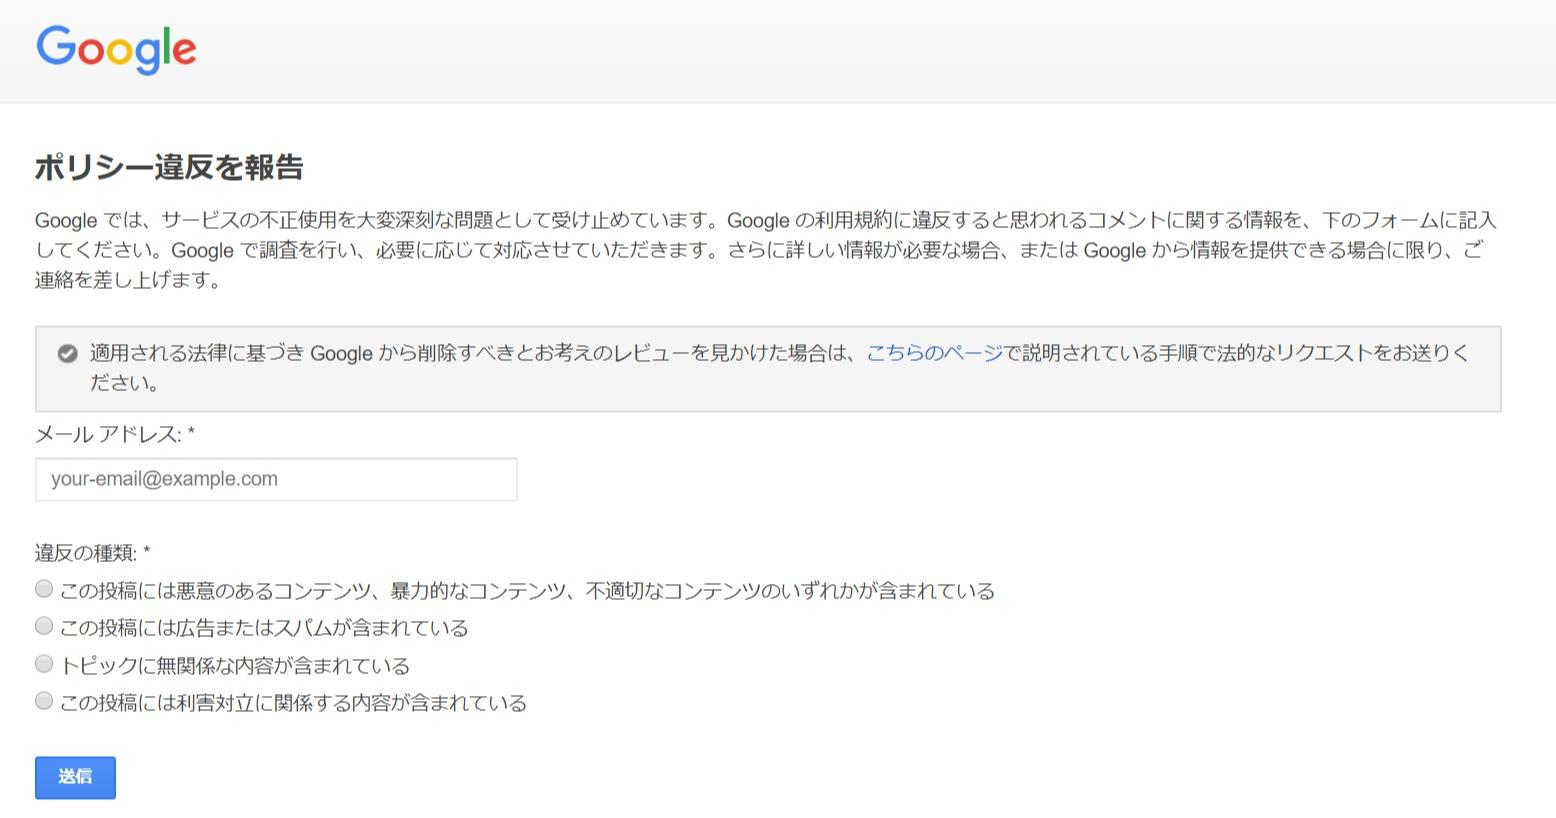 Google ポリシー違反を報告フォーム